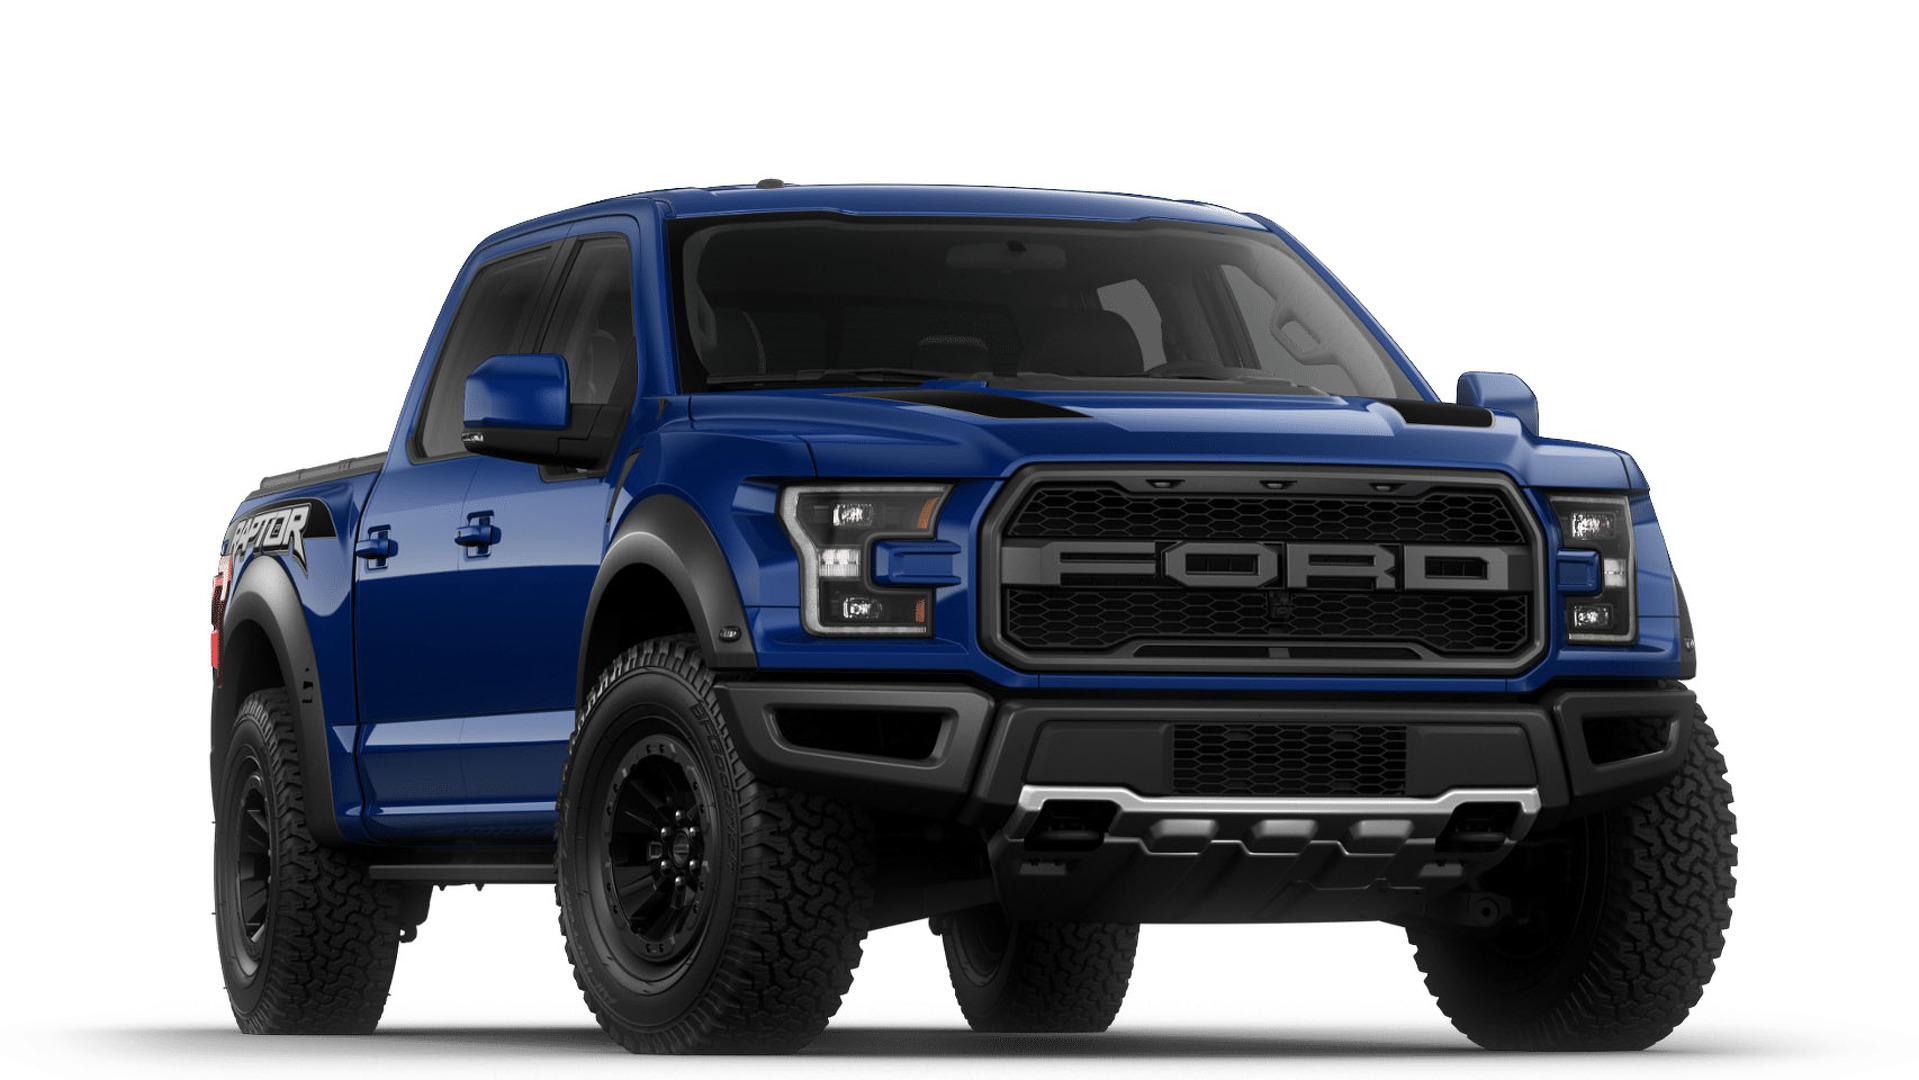 trucks venus slide ford specials raptor price s ewald shelby